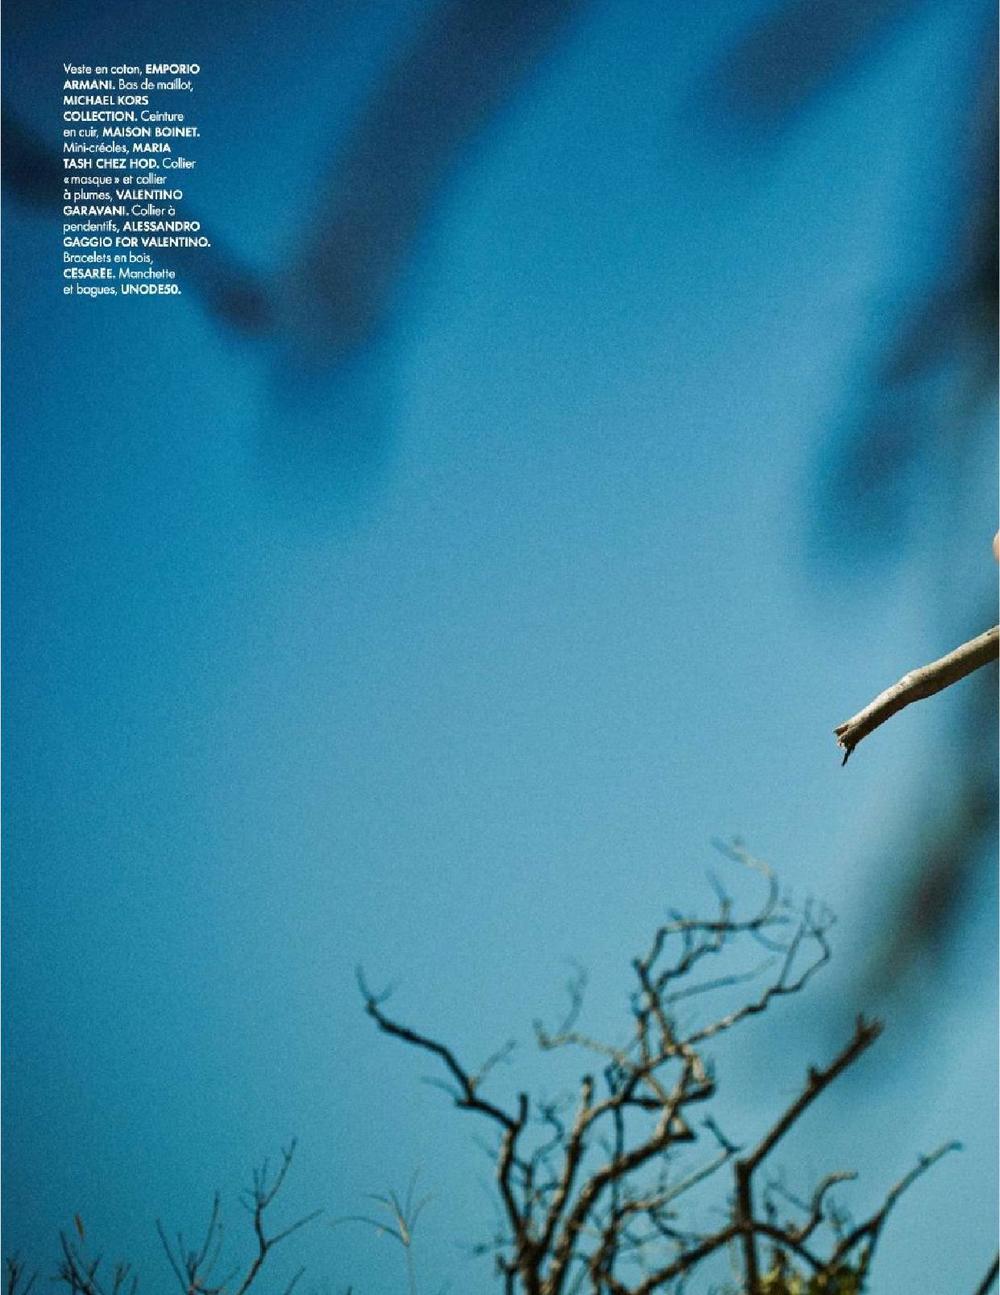 raica-oliveira-serge-leblon-elle-france-6-17- (18).jpg